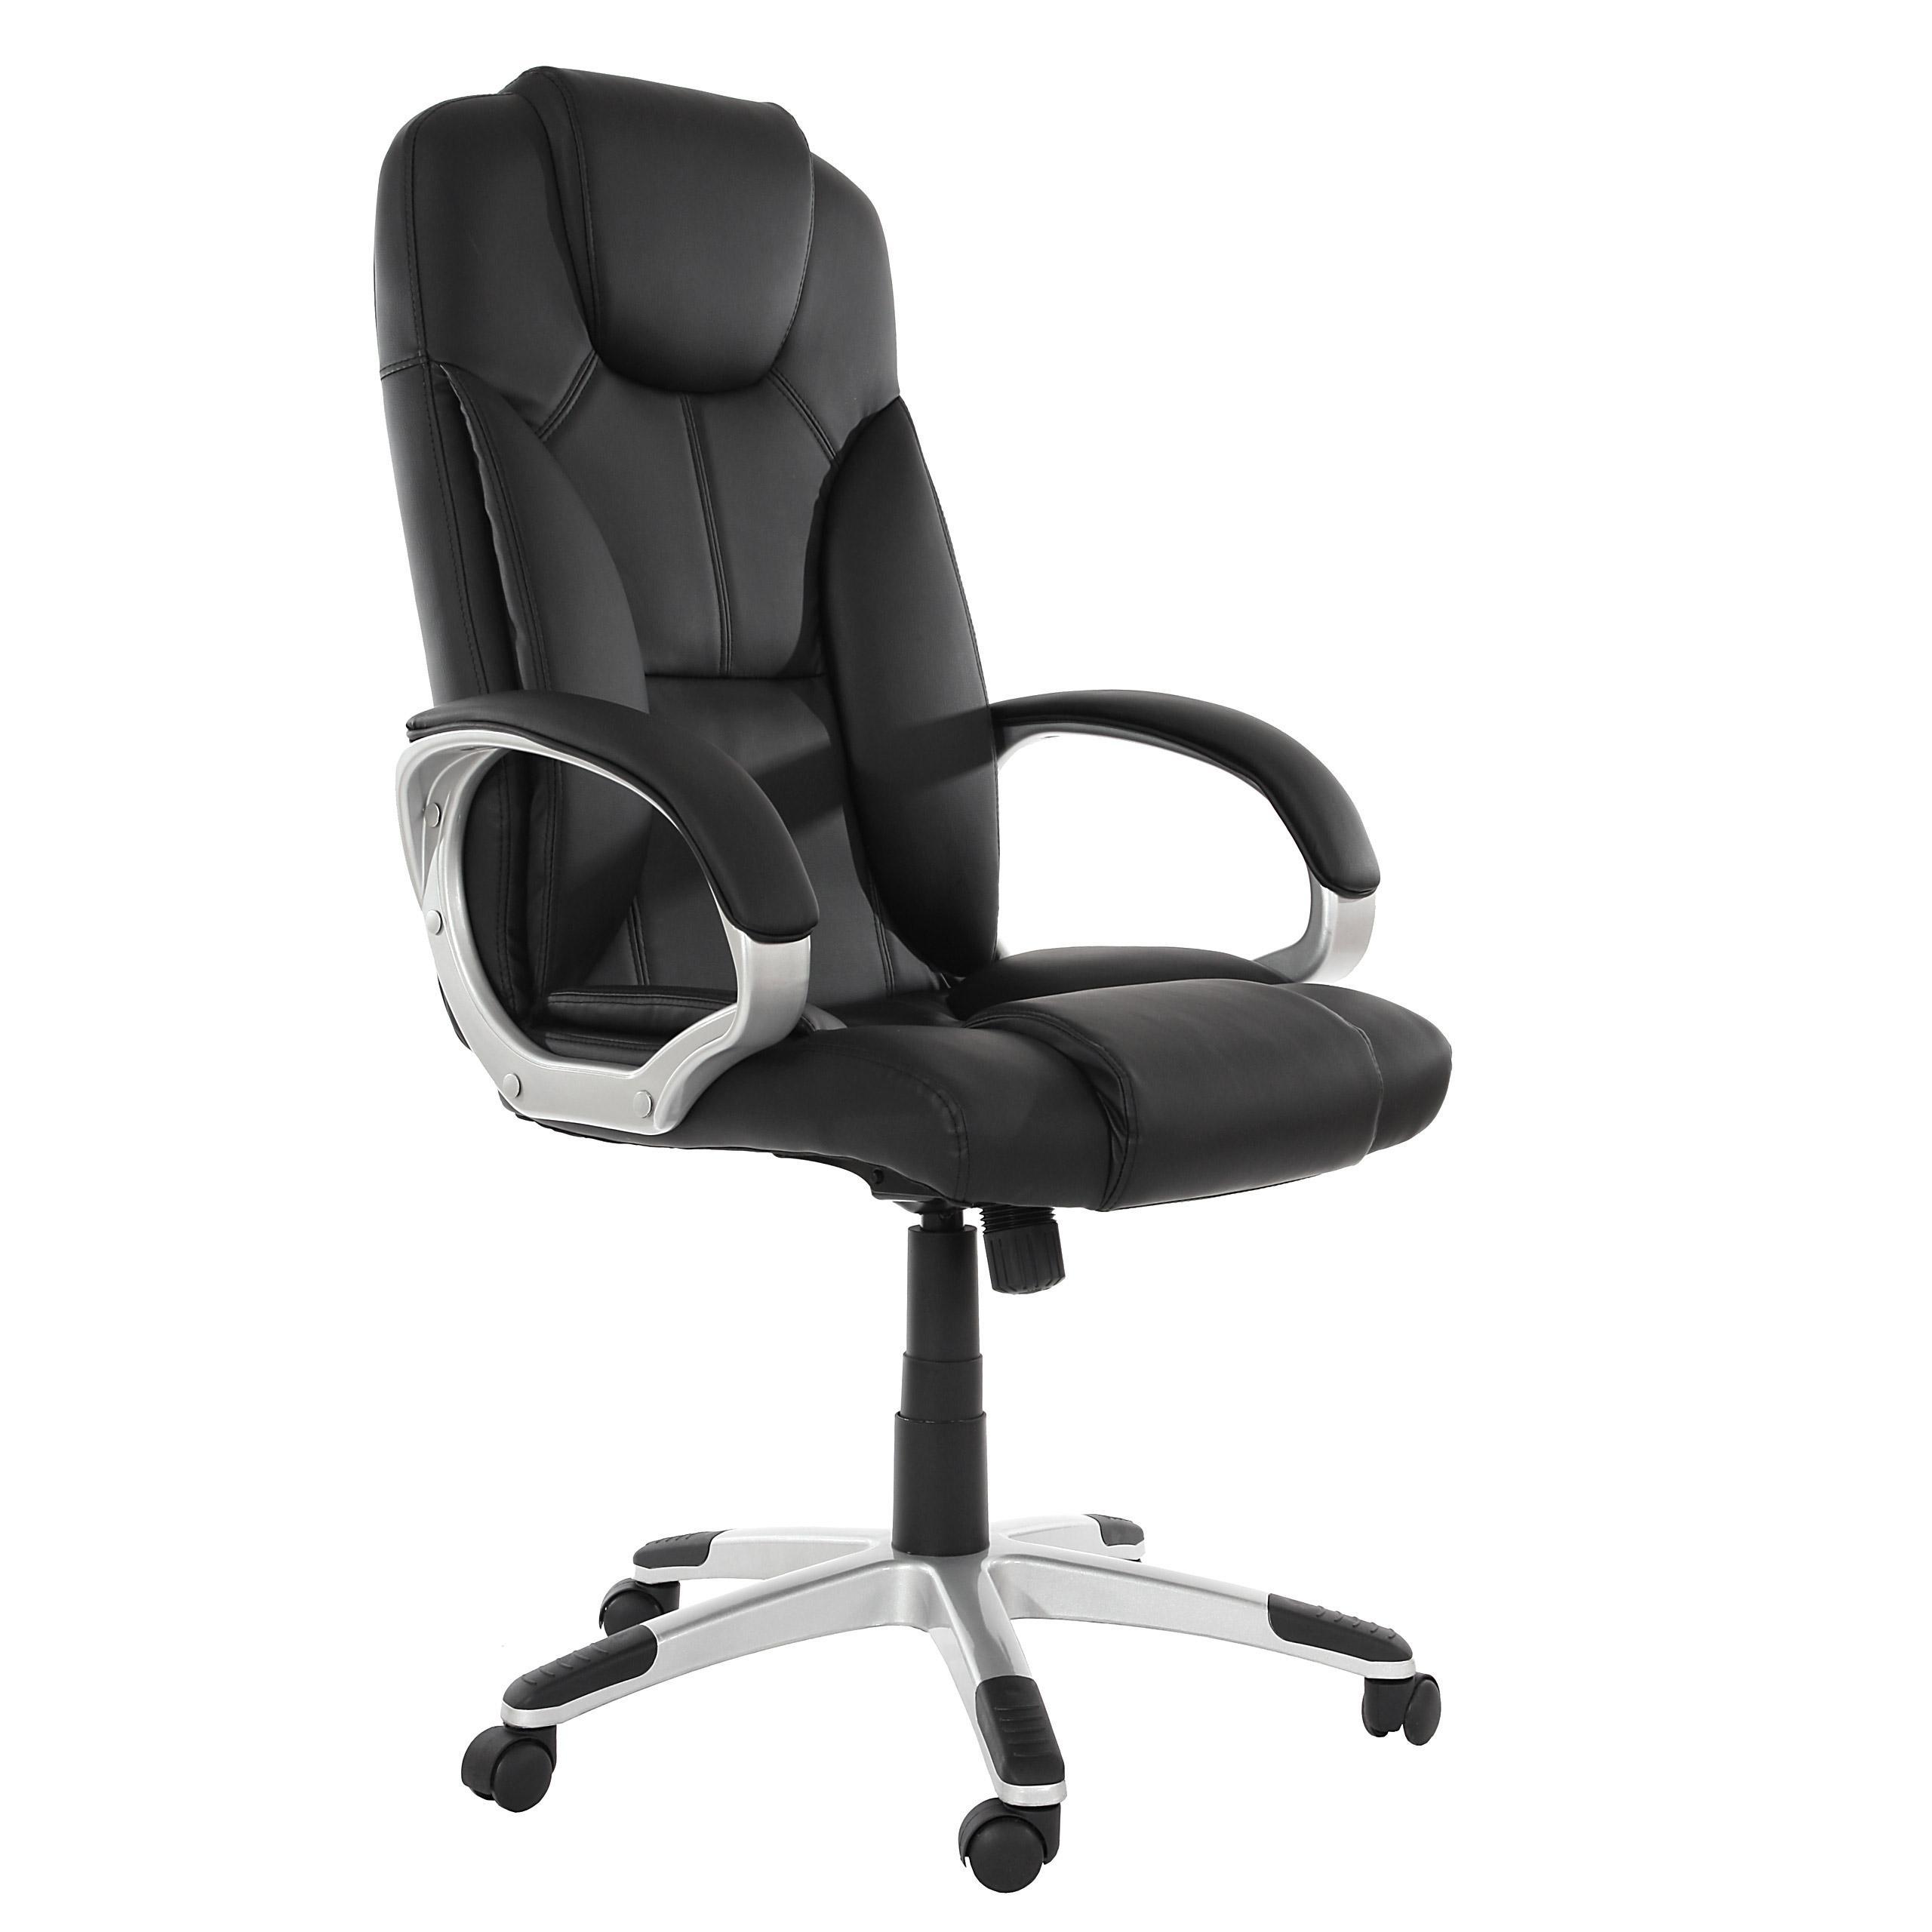 Sill n de oficina arona precio insuperable gran for Precio de sillones para oficina